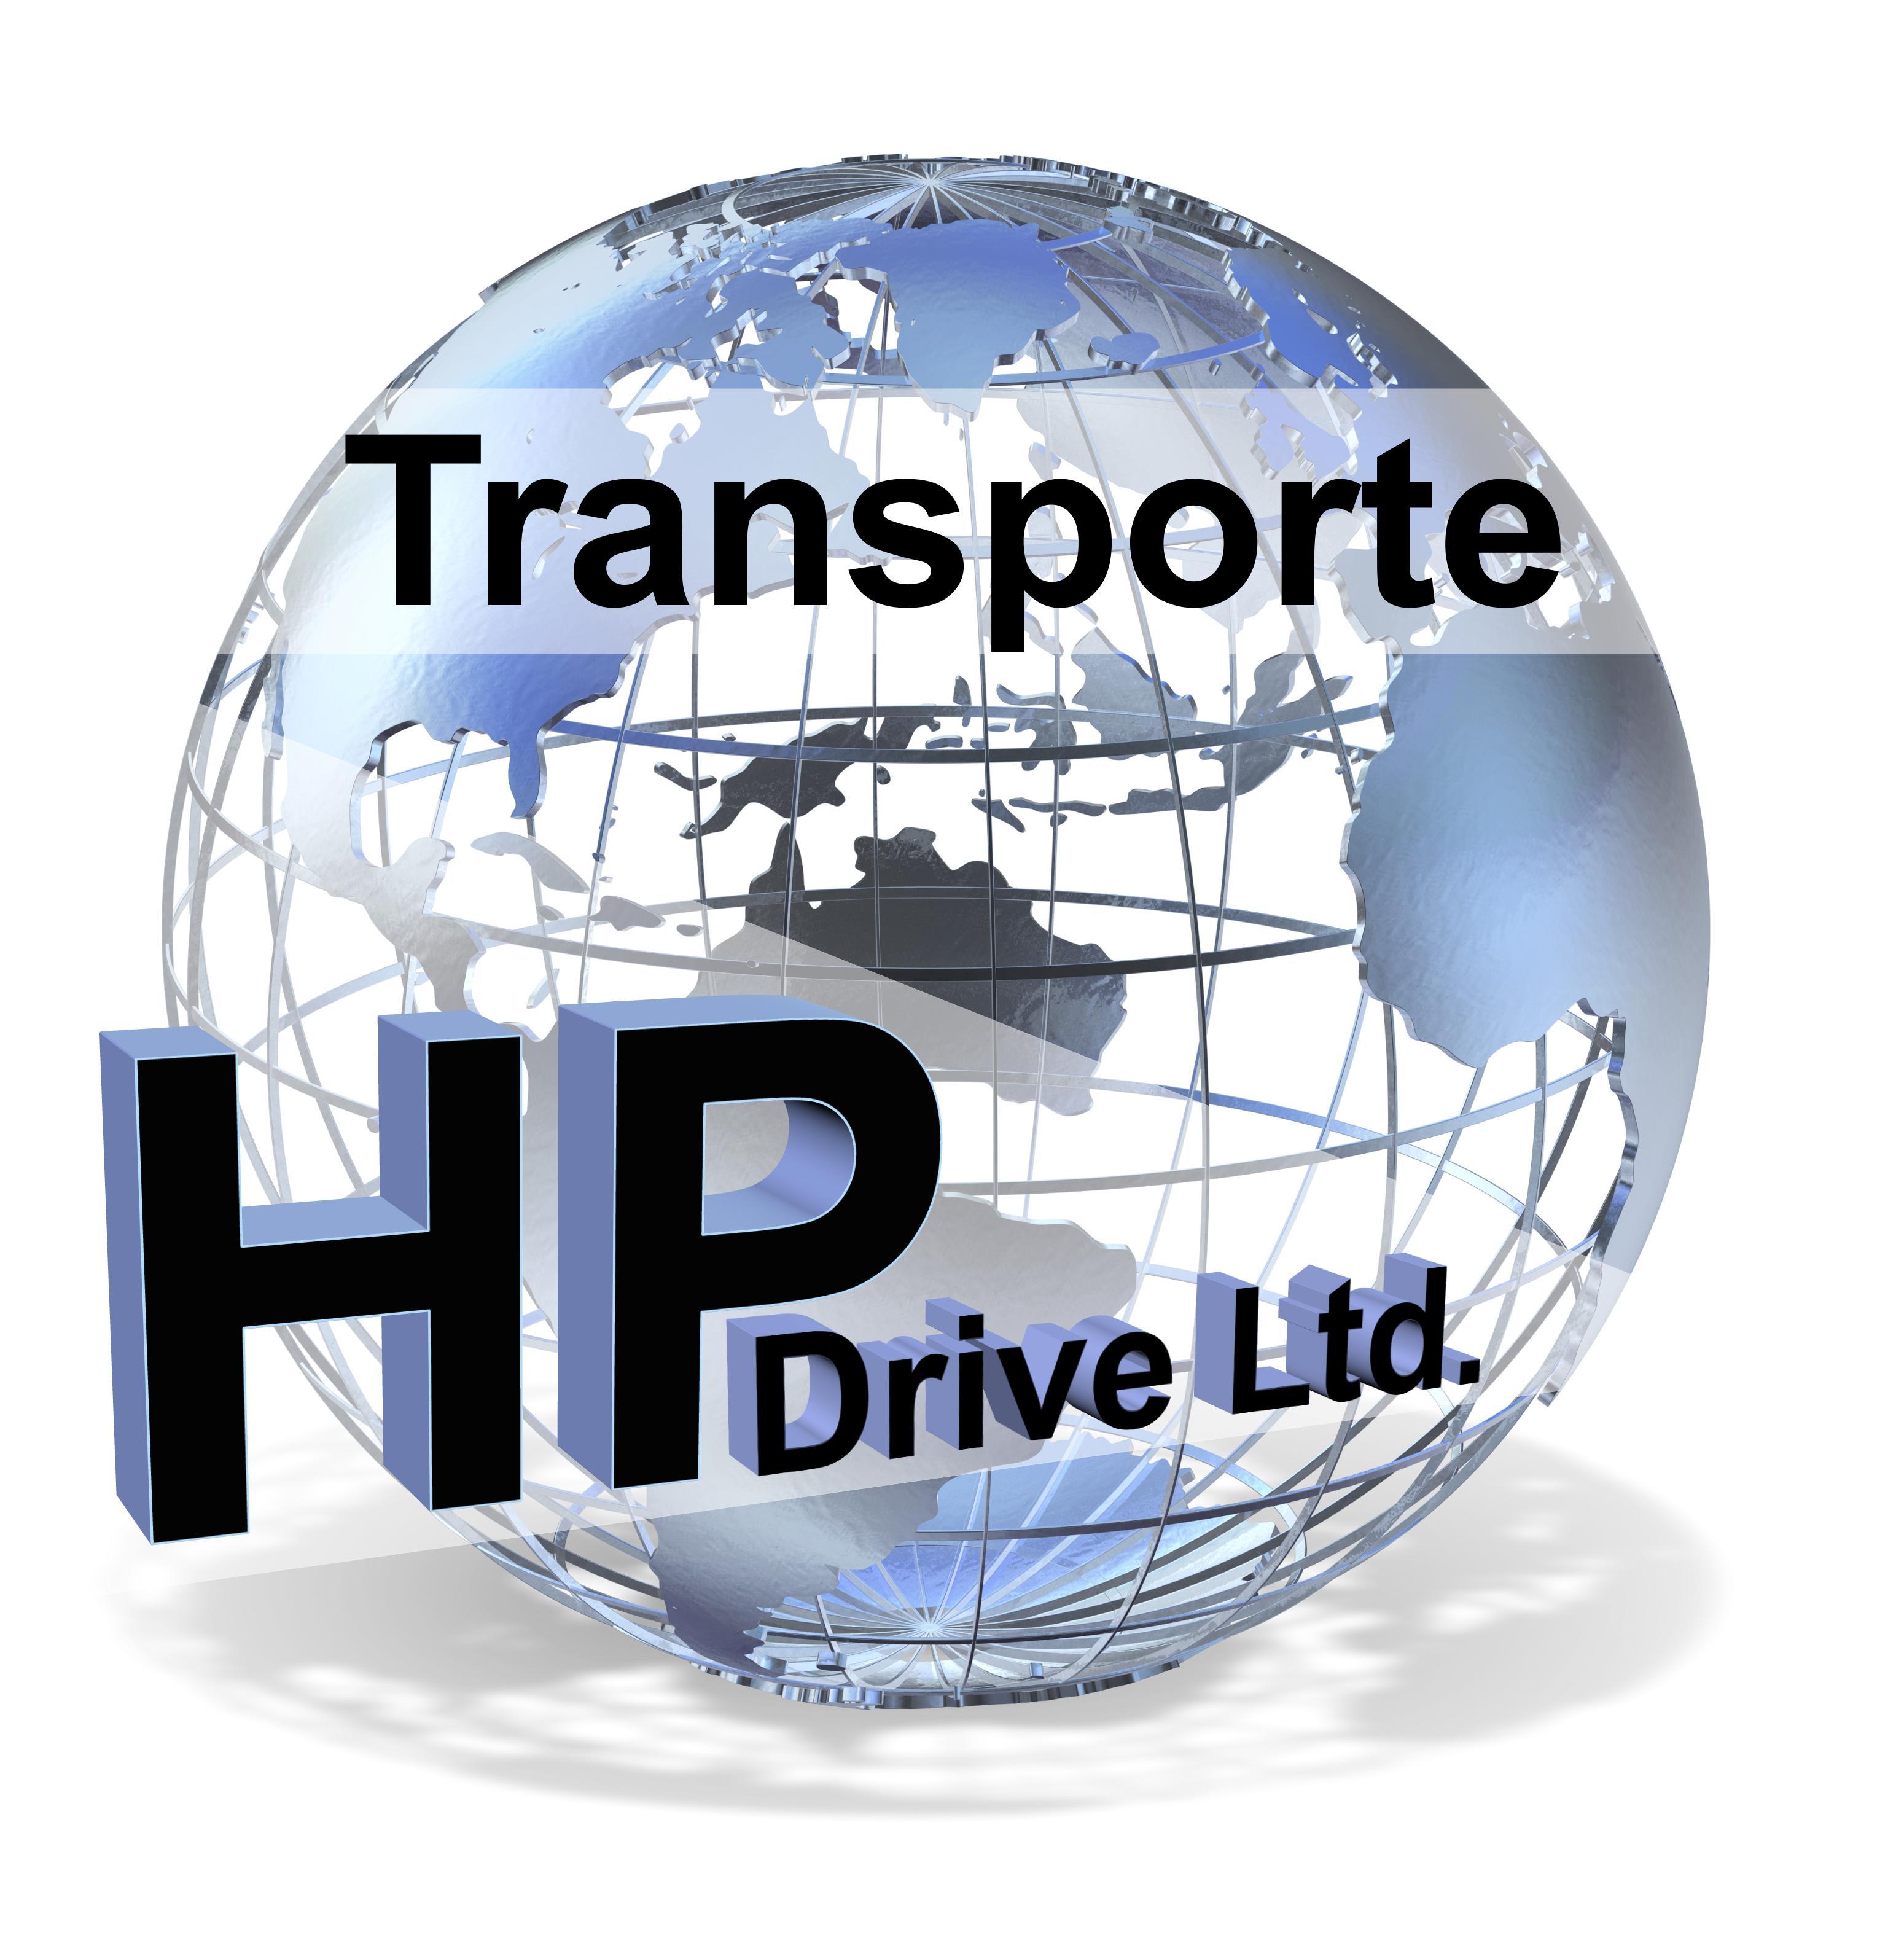 Transporte HP-Drive Ltd.